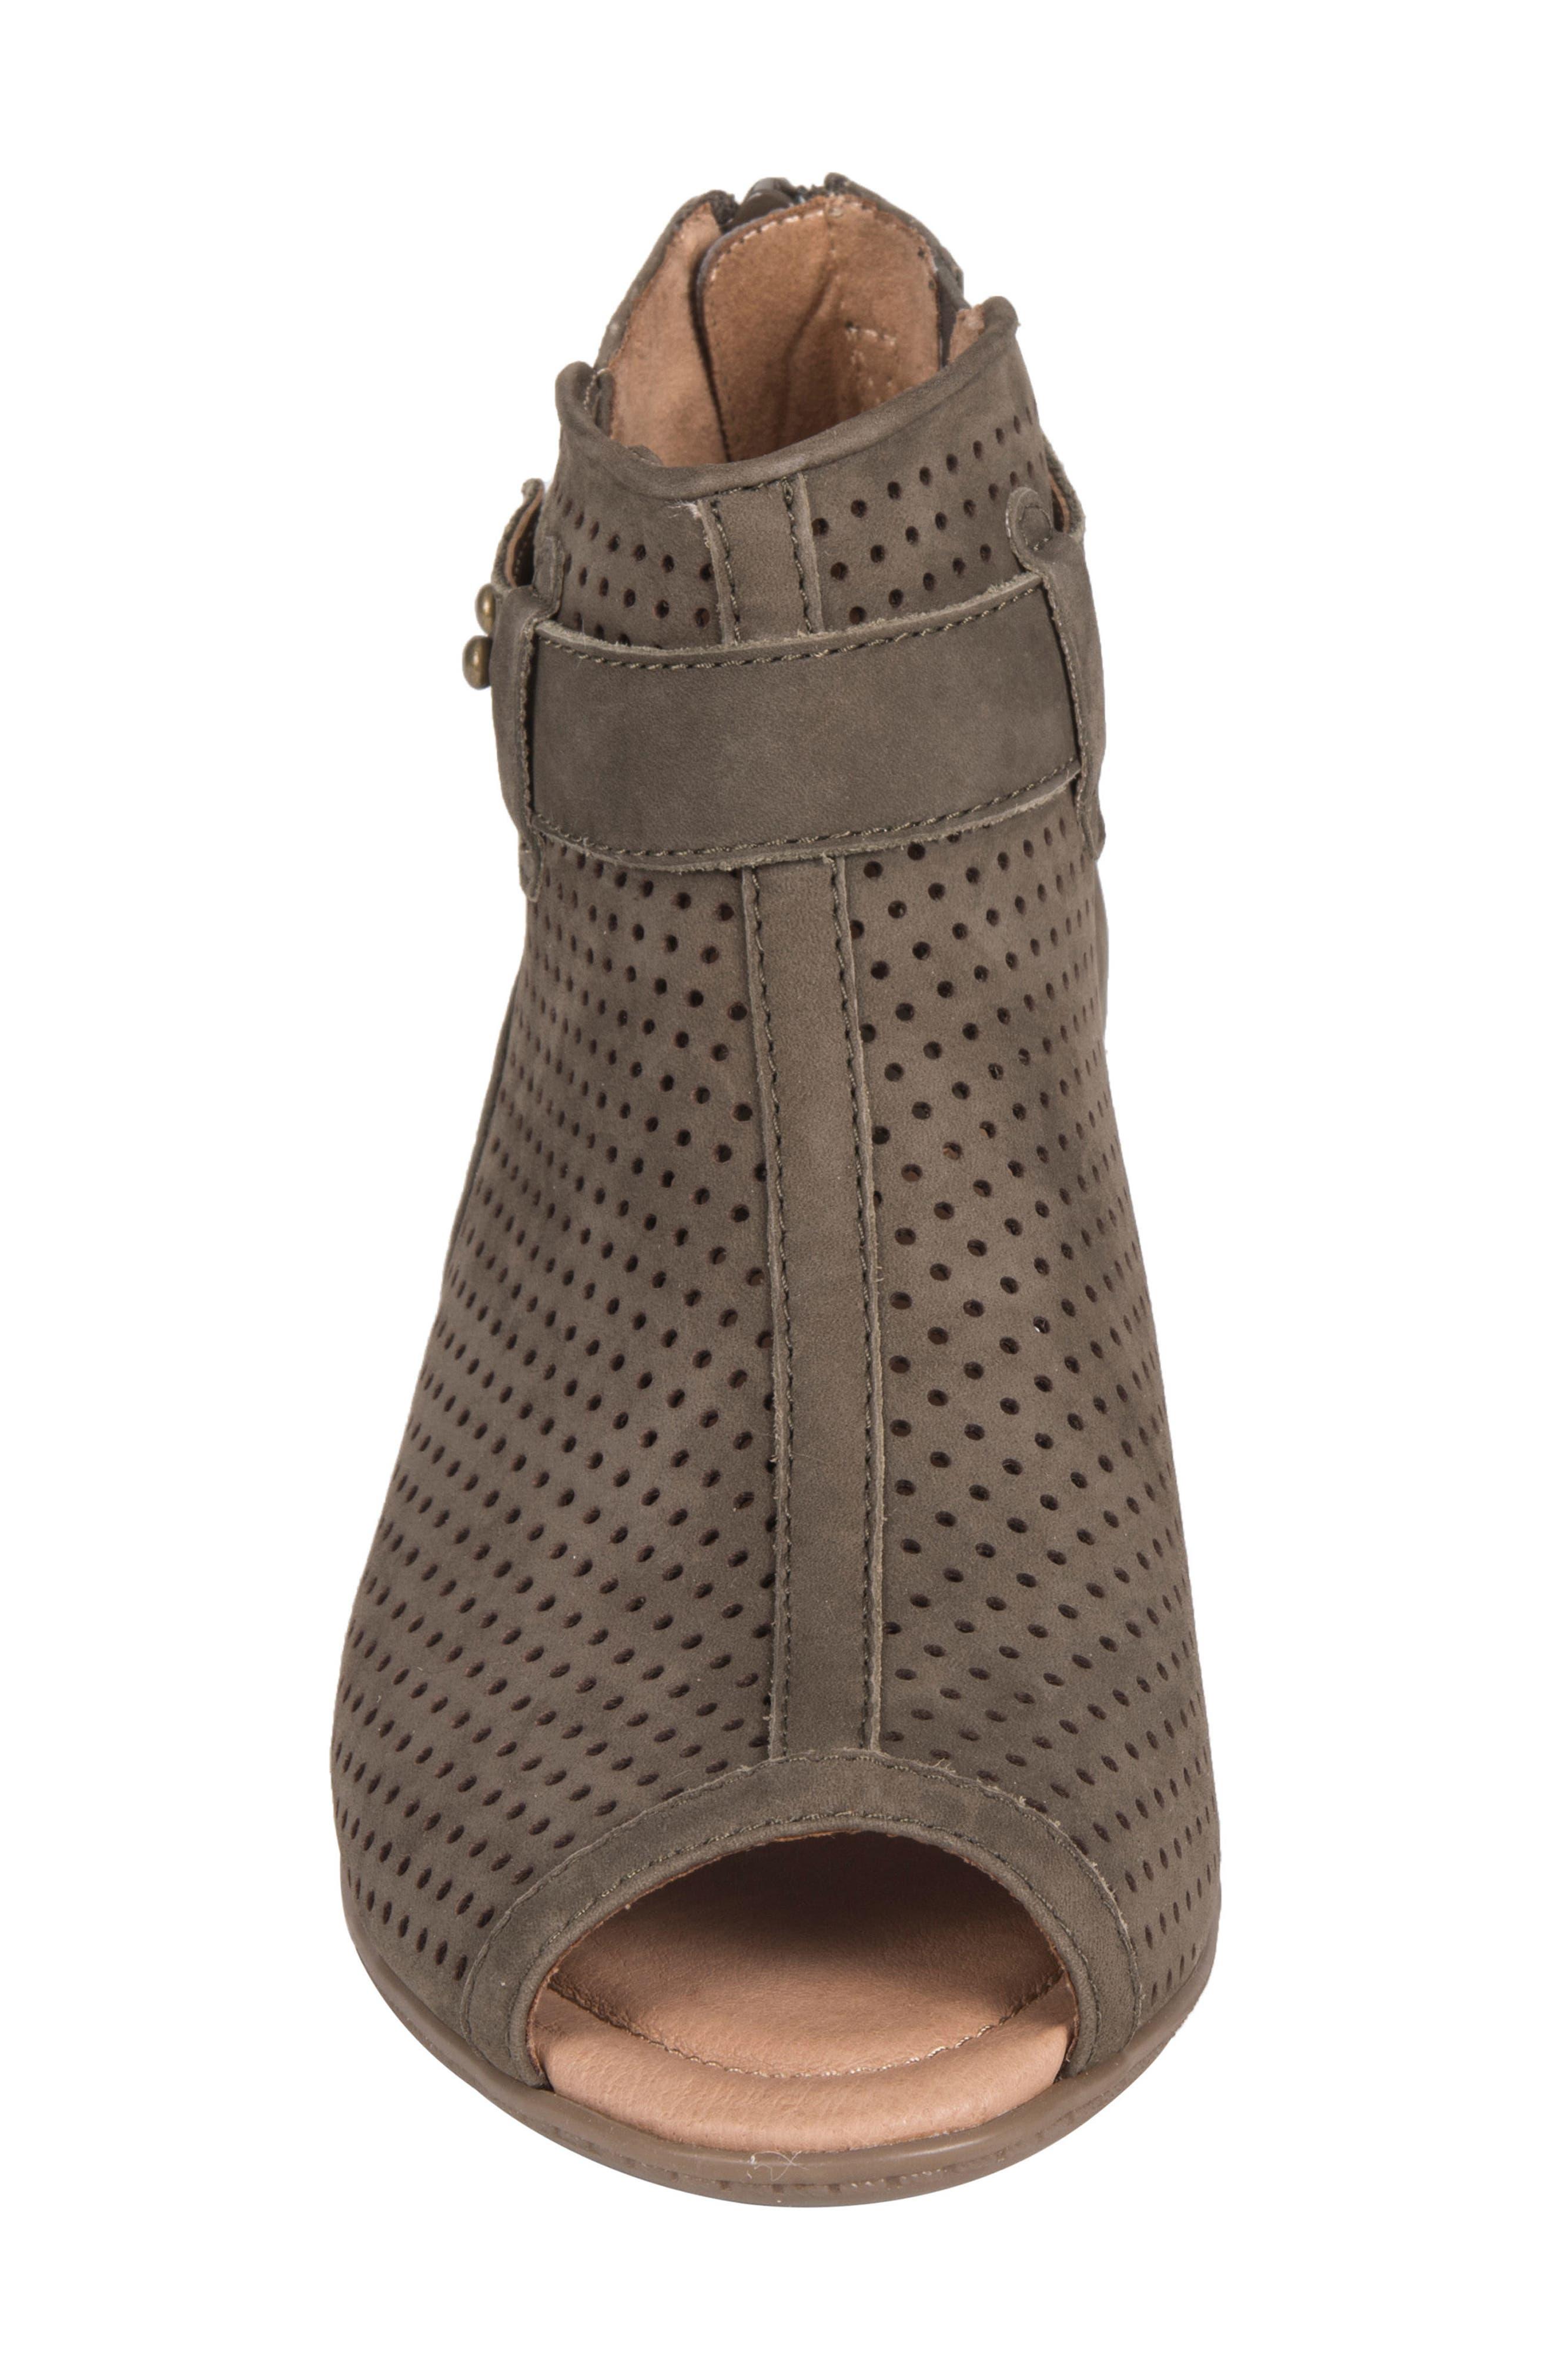 Alternate Image 4  - Earth® 'Intrepid' Peep Toe Bootie (Women)